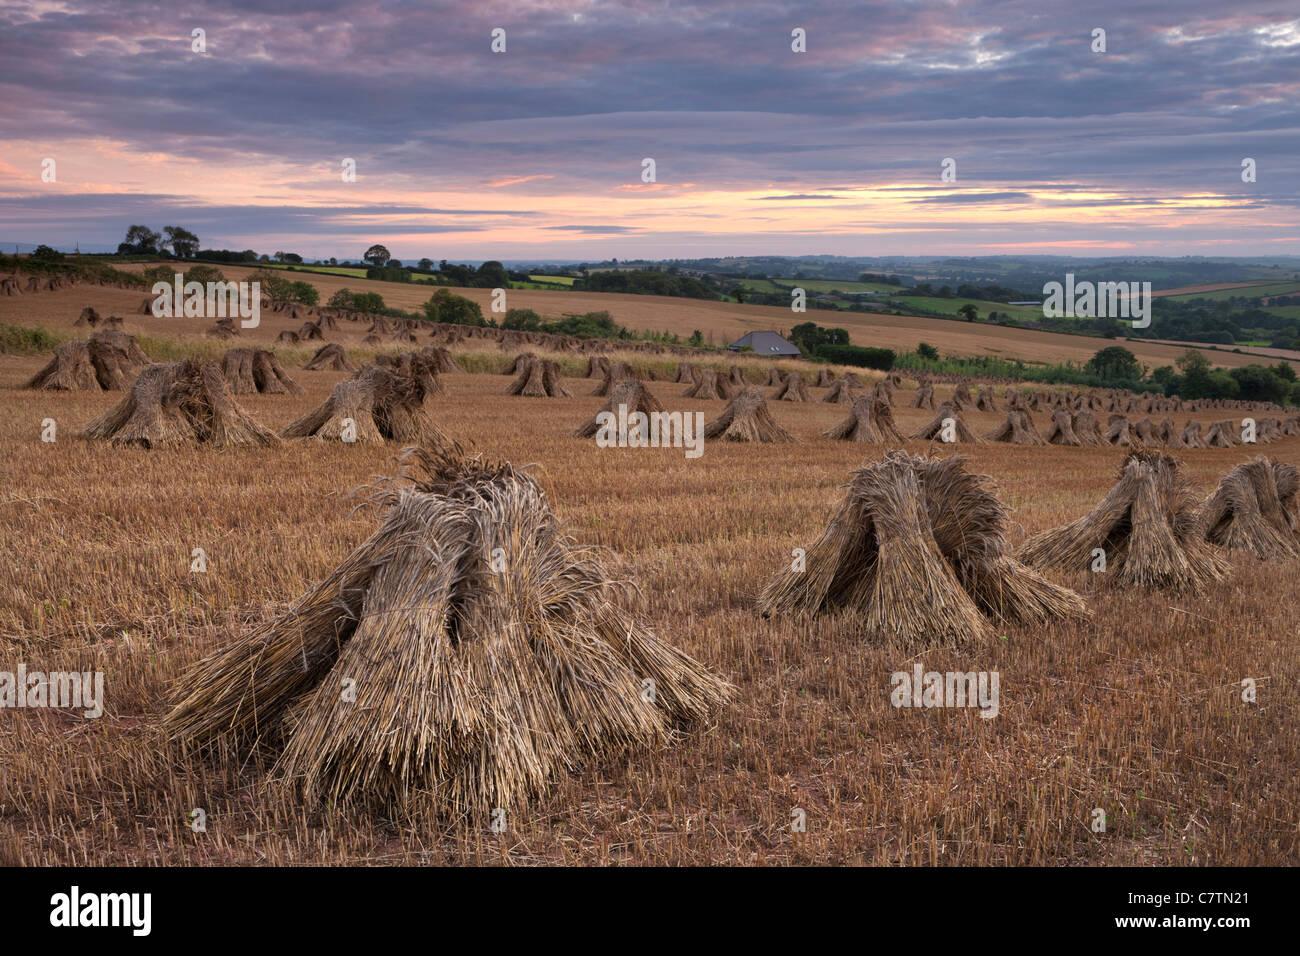 Corn stooks in a Devon field at sunset, Newbuildings, Devon, England. Summer (July) 2011. - Stock Image